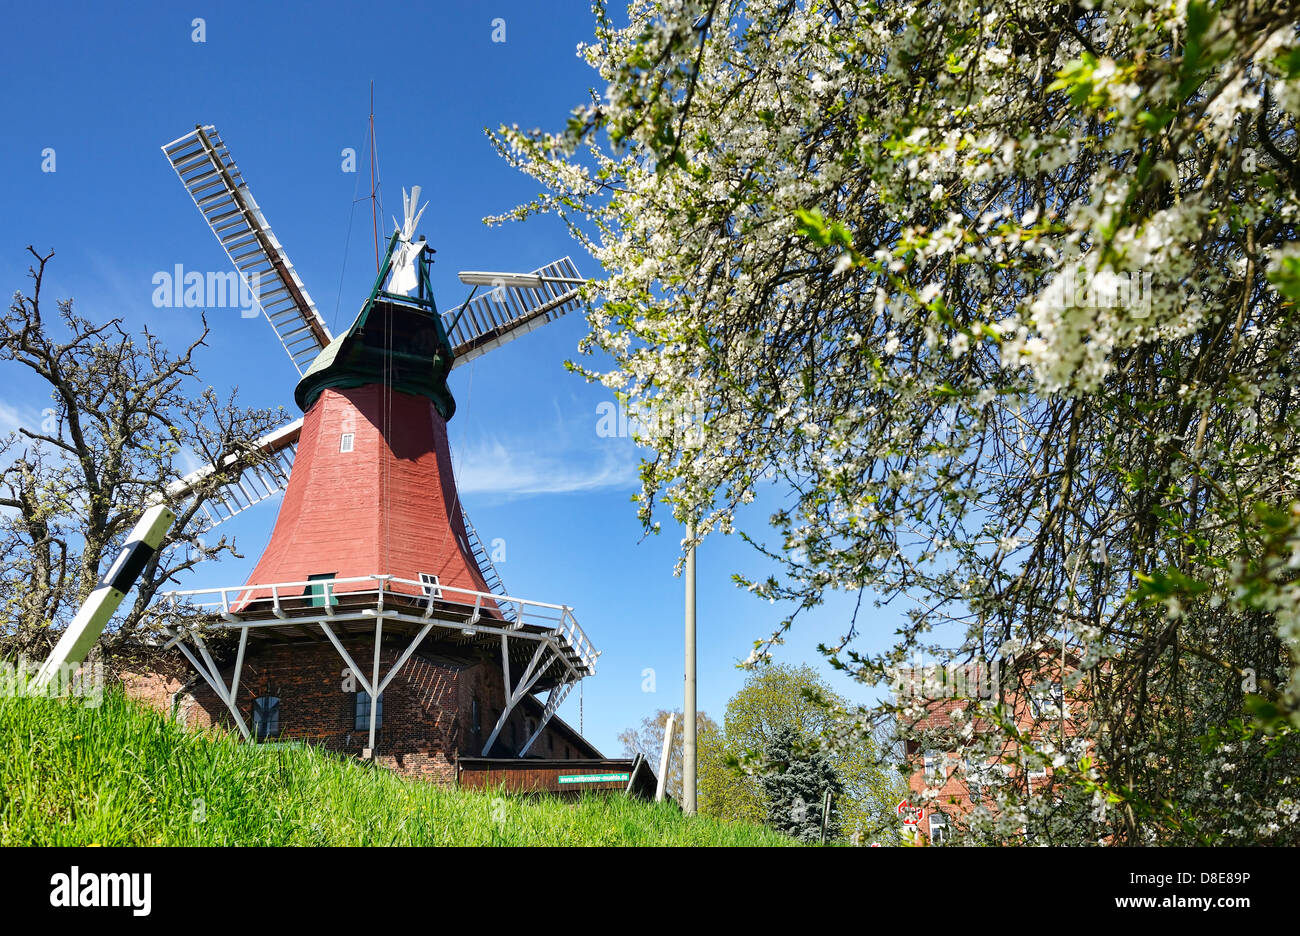 Reitbrooker Muehle mill in Hamburg, Germany, Europe - Stock Image